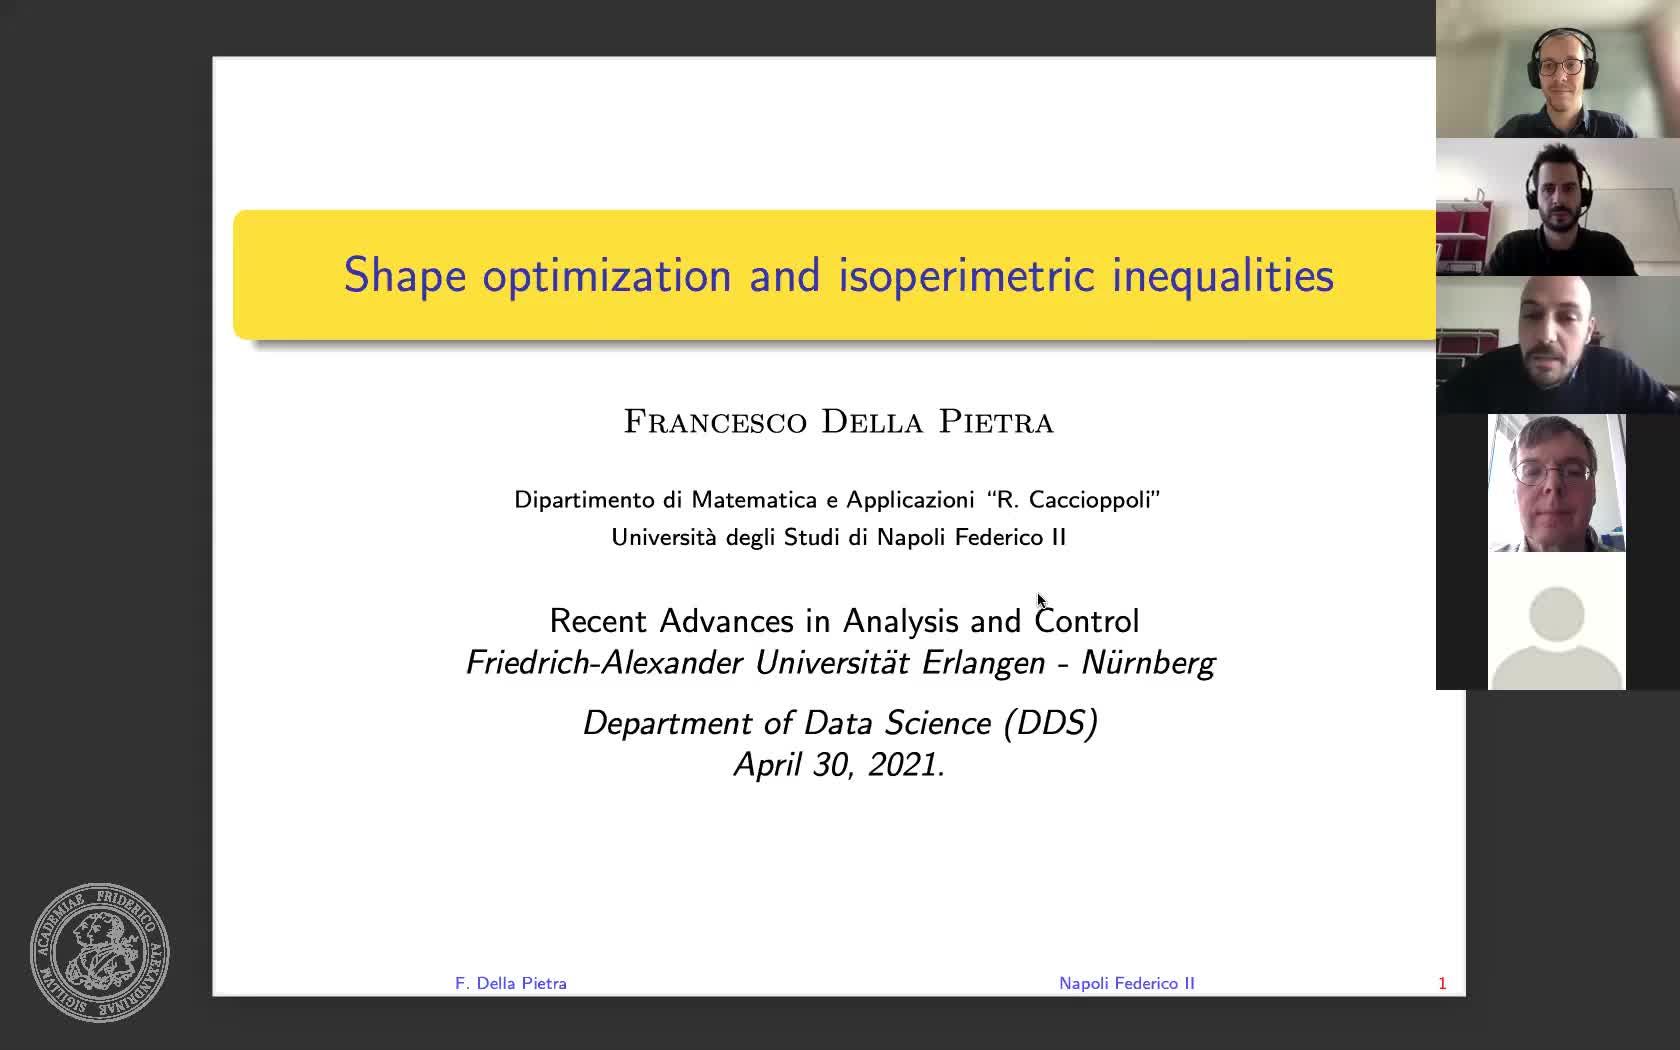 Shape optimization and isoperimetric inequalities (F. Della Pietra, University of Naples Federico II) preview image